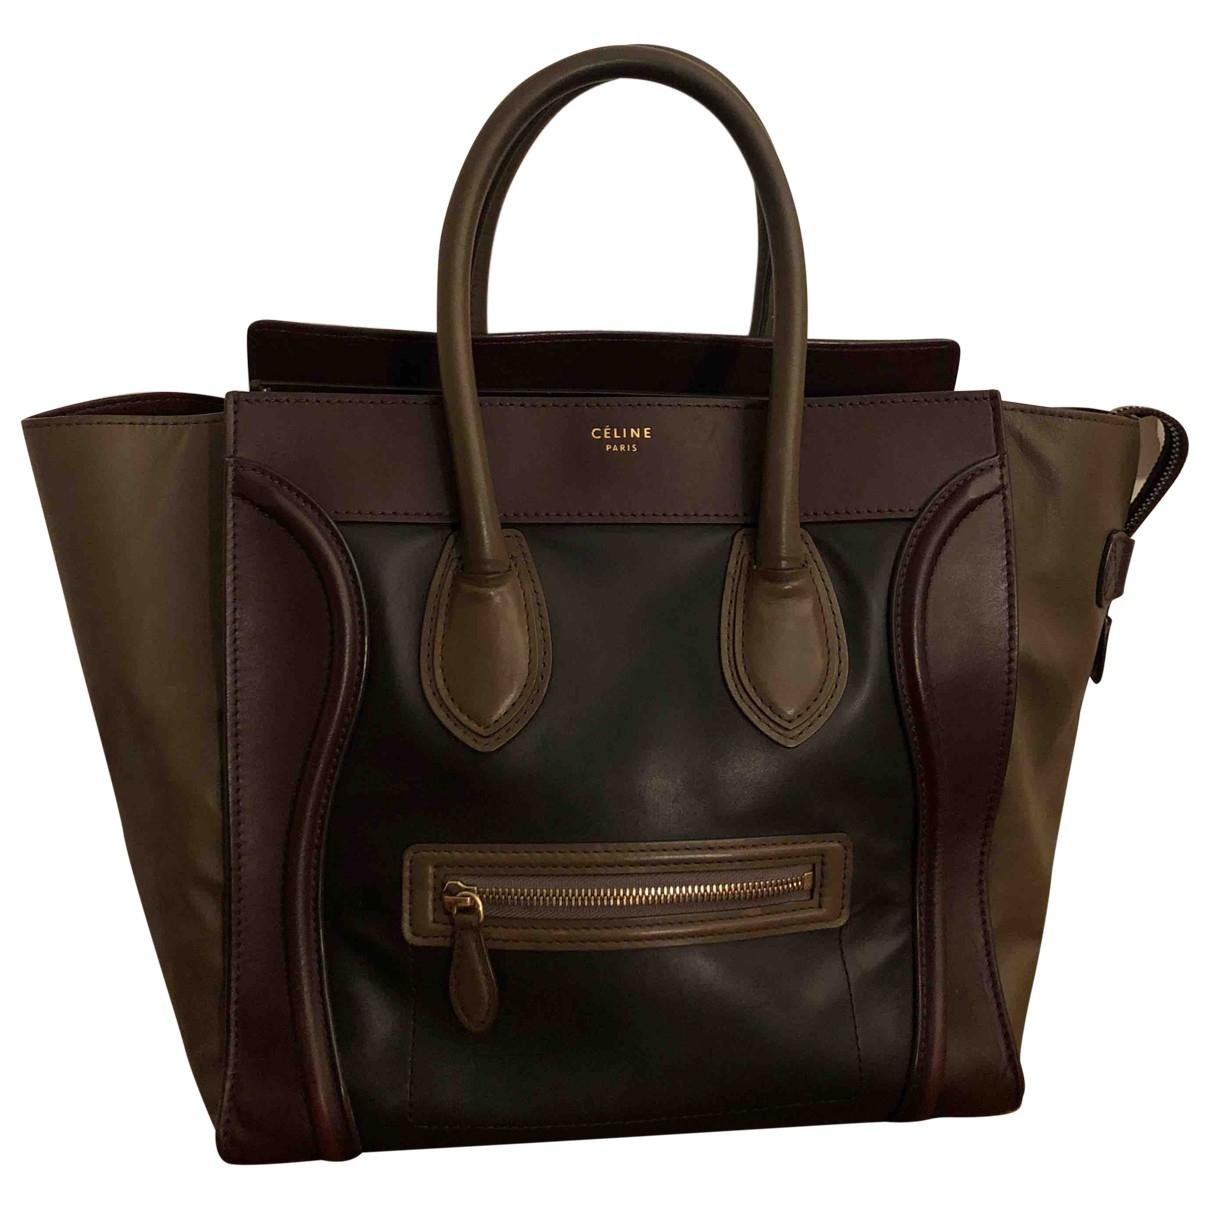 Celine - Sac a main Luggage pour femme en cuir - kaki